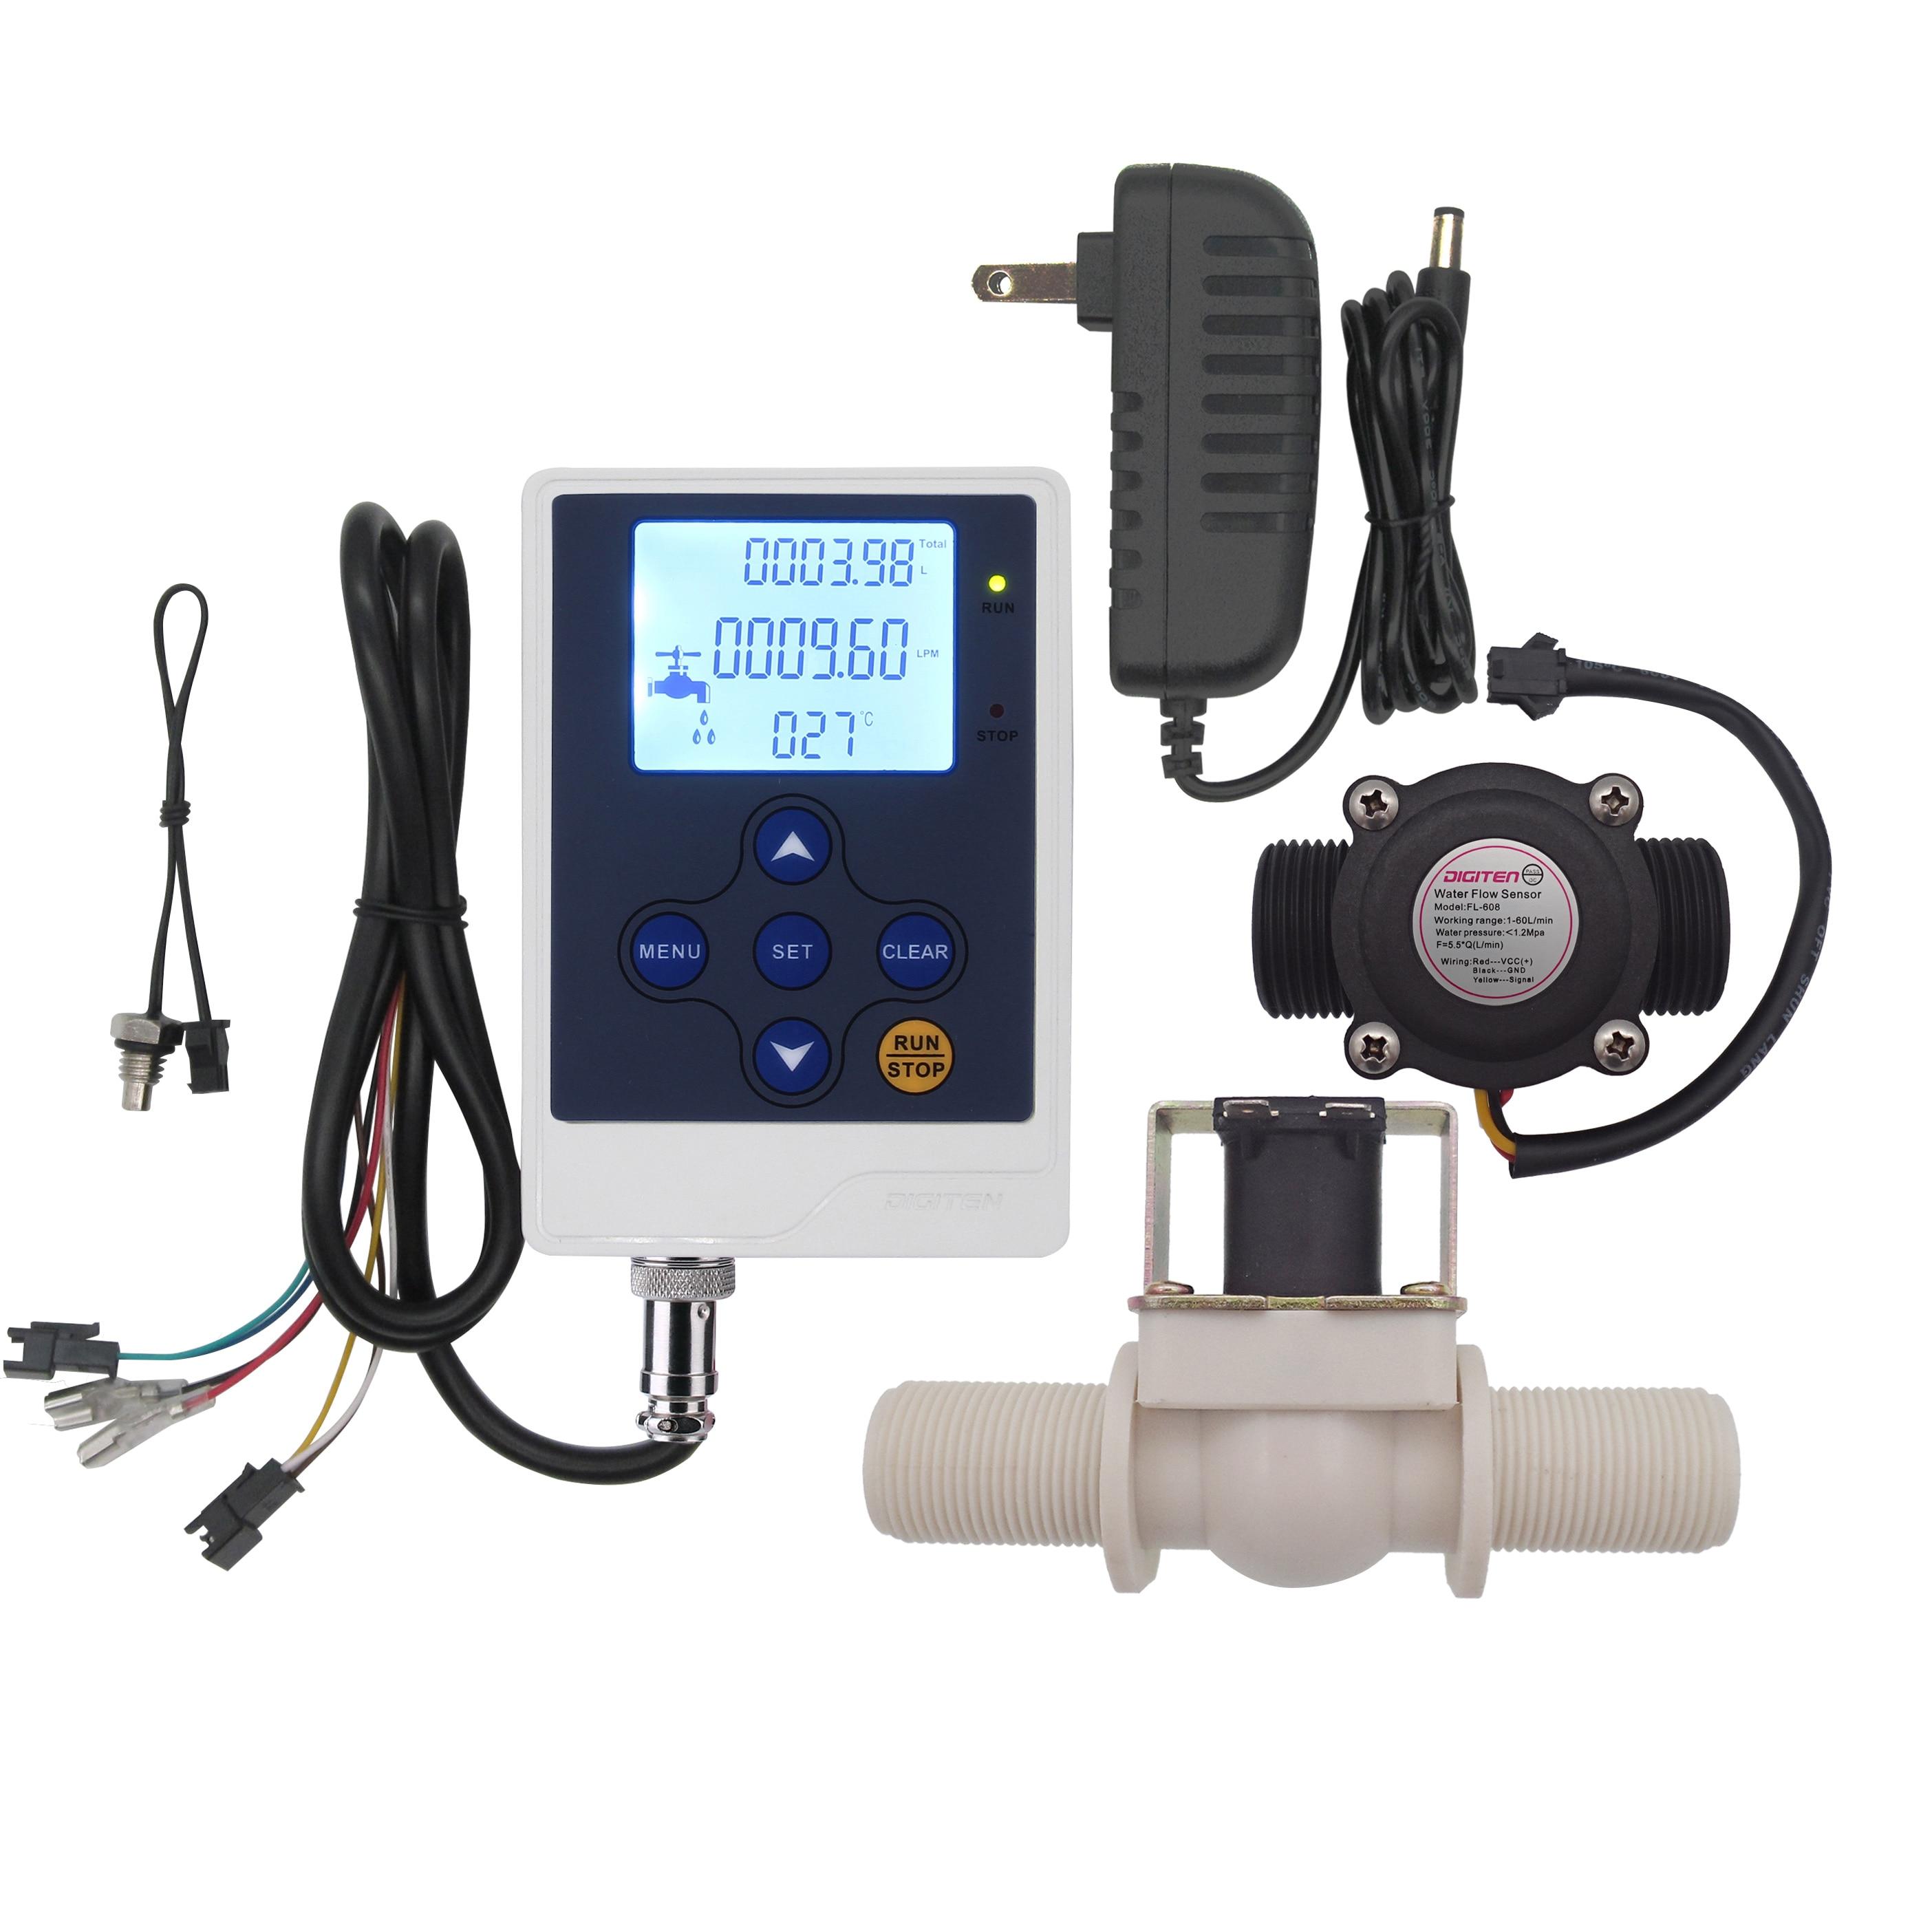 "Controlador de pantalla LCD DIGITEN de Control de flujo de agua + Sensor de sala G3/4 ""medidor de flujo contador + Válvula Solenoide G3/4"" normalmente C"